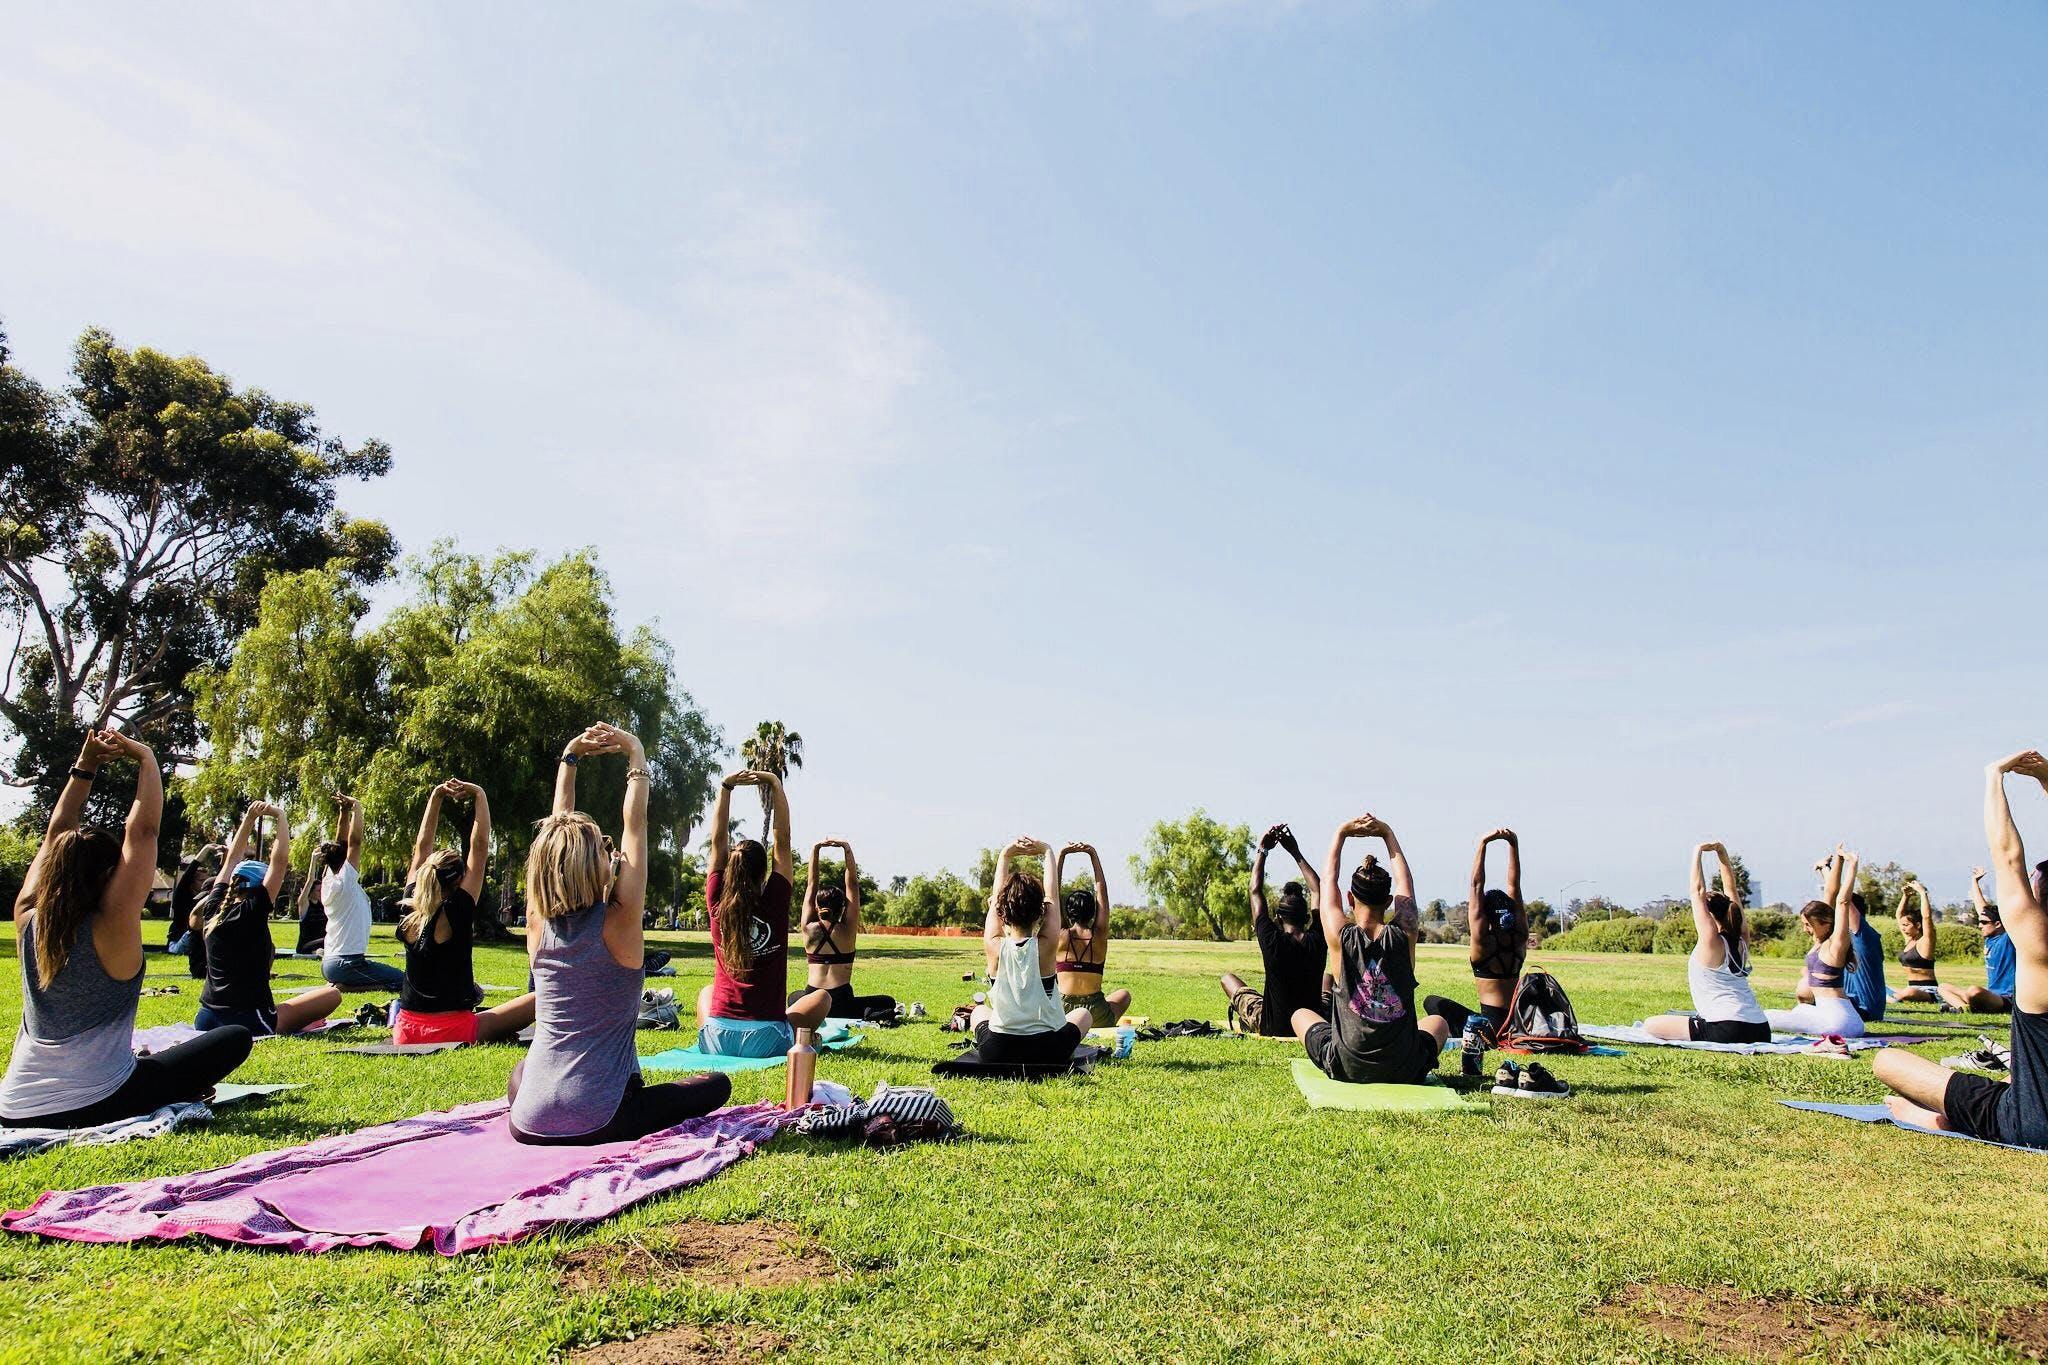 Meditation + HIIT + Yoga